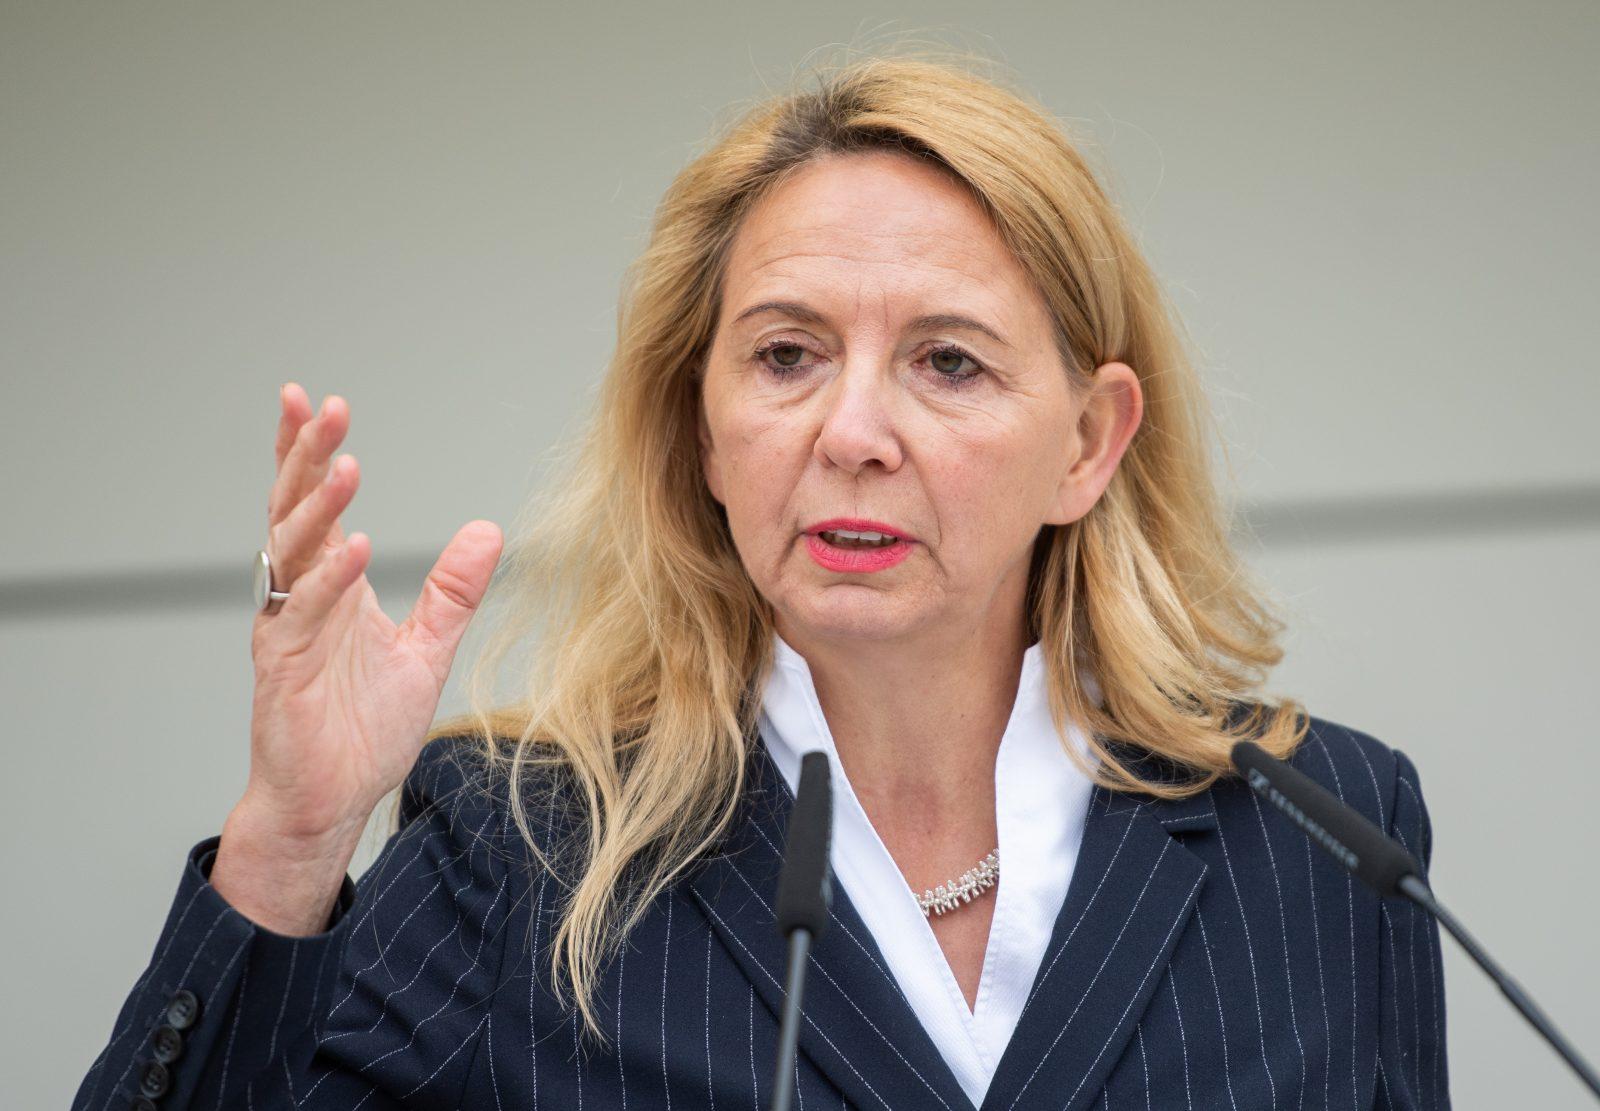 Berlins Polizeipräsidentin Barbara Slowik kündigt Kurse gegen Racial Profiliga bei den Sicherheitskräften an Foto: picture alliance/dpa | Christophe Gateau